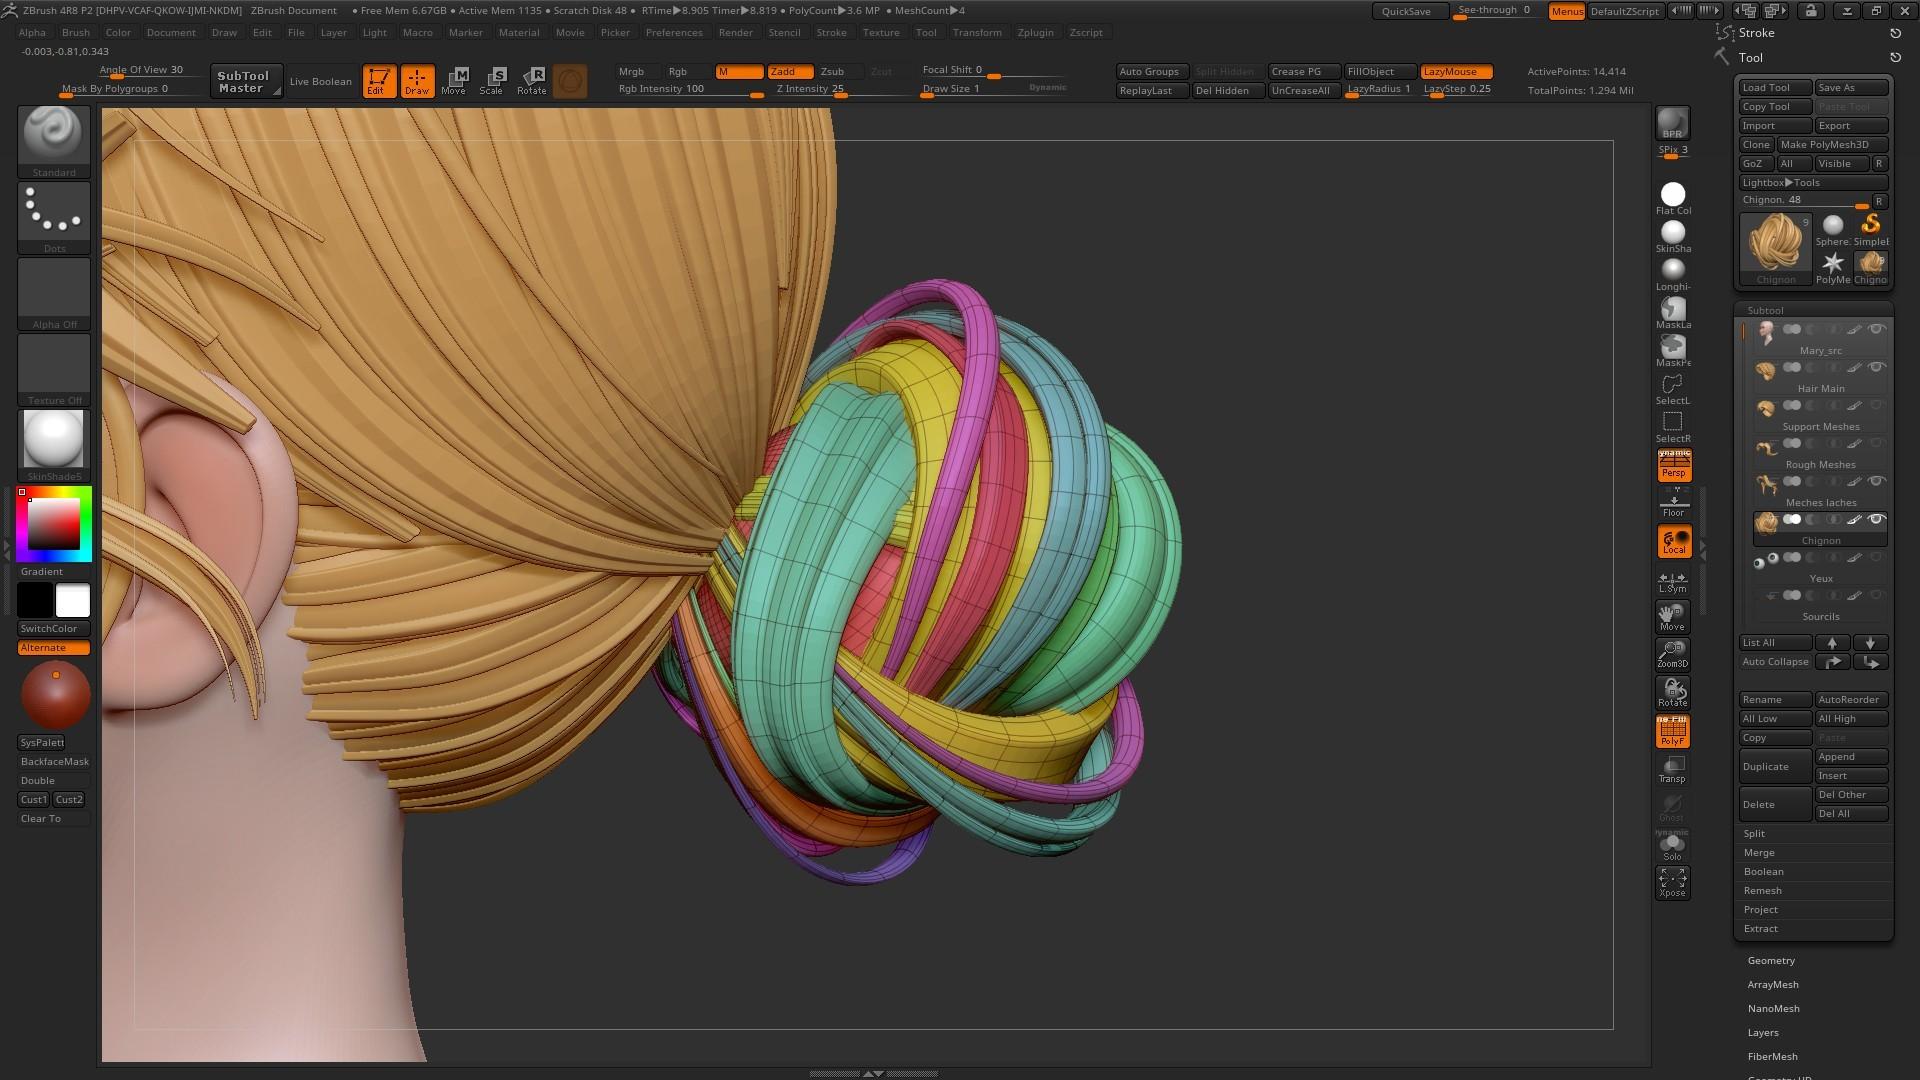 Zbrush tipzzz. Zbruhs4 hairwave modeling #zbrush #tutorial.